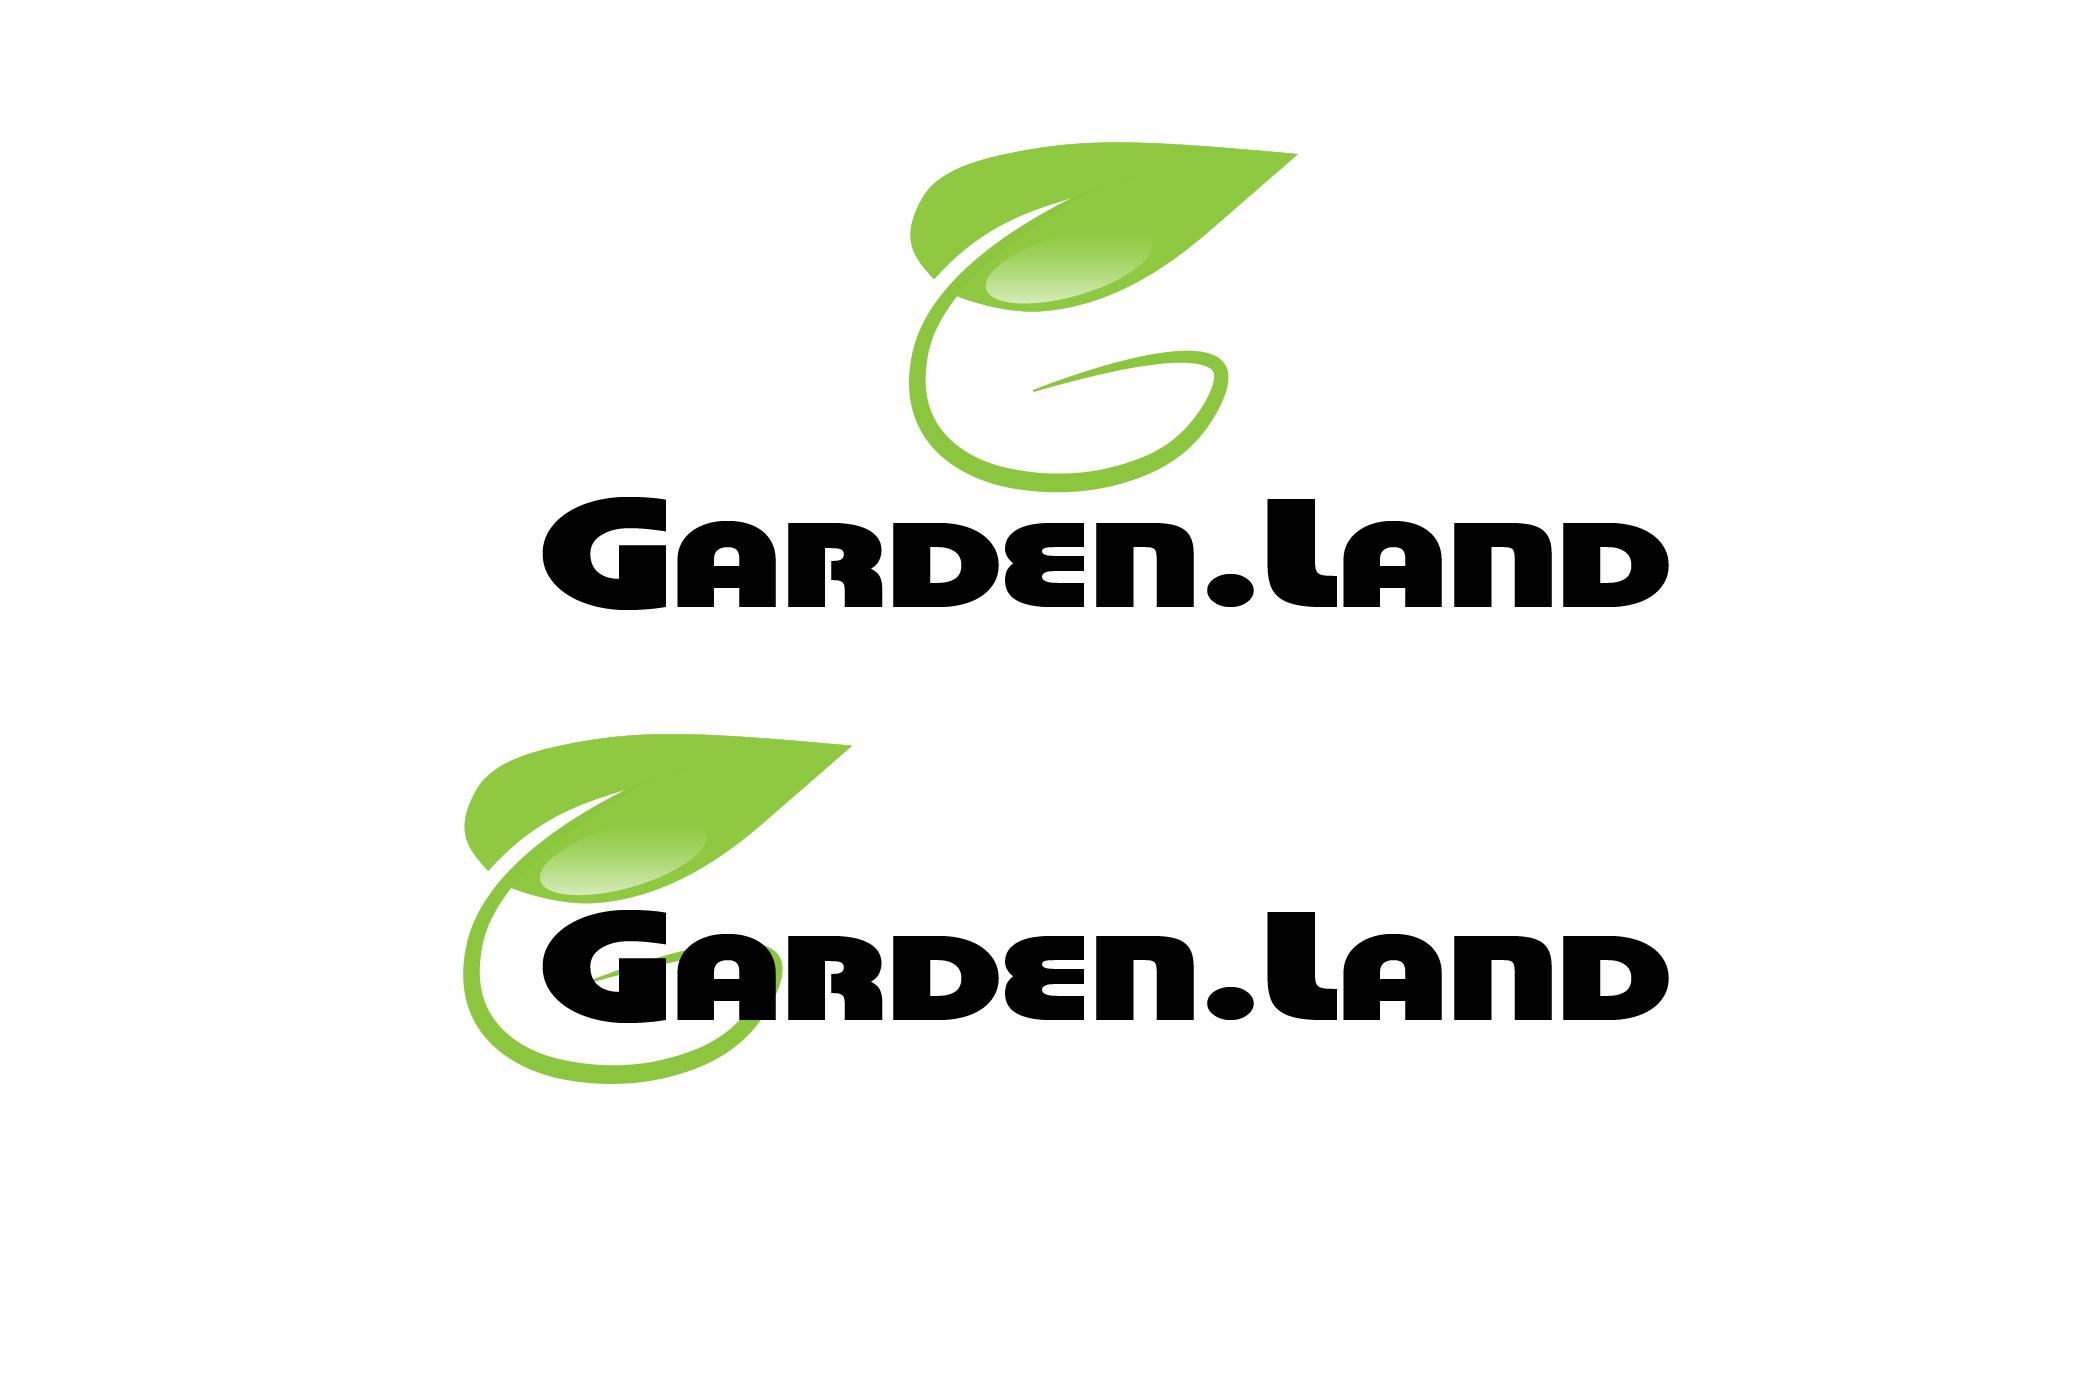 Создание логотипа компании Garden.Land фото f_2555986e91ad3663.jpg